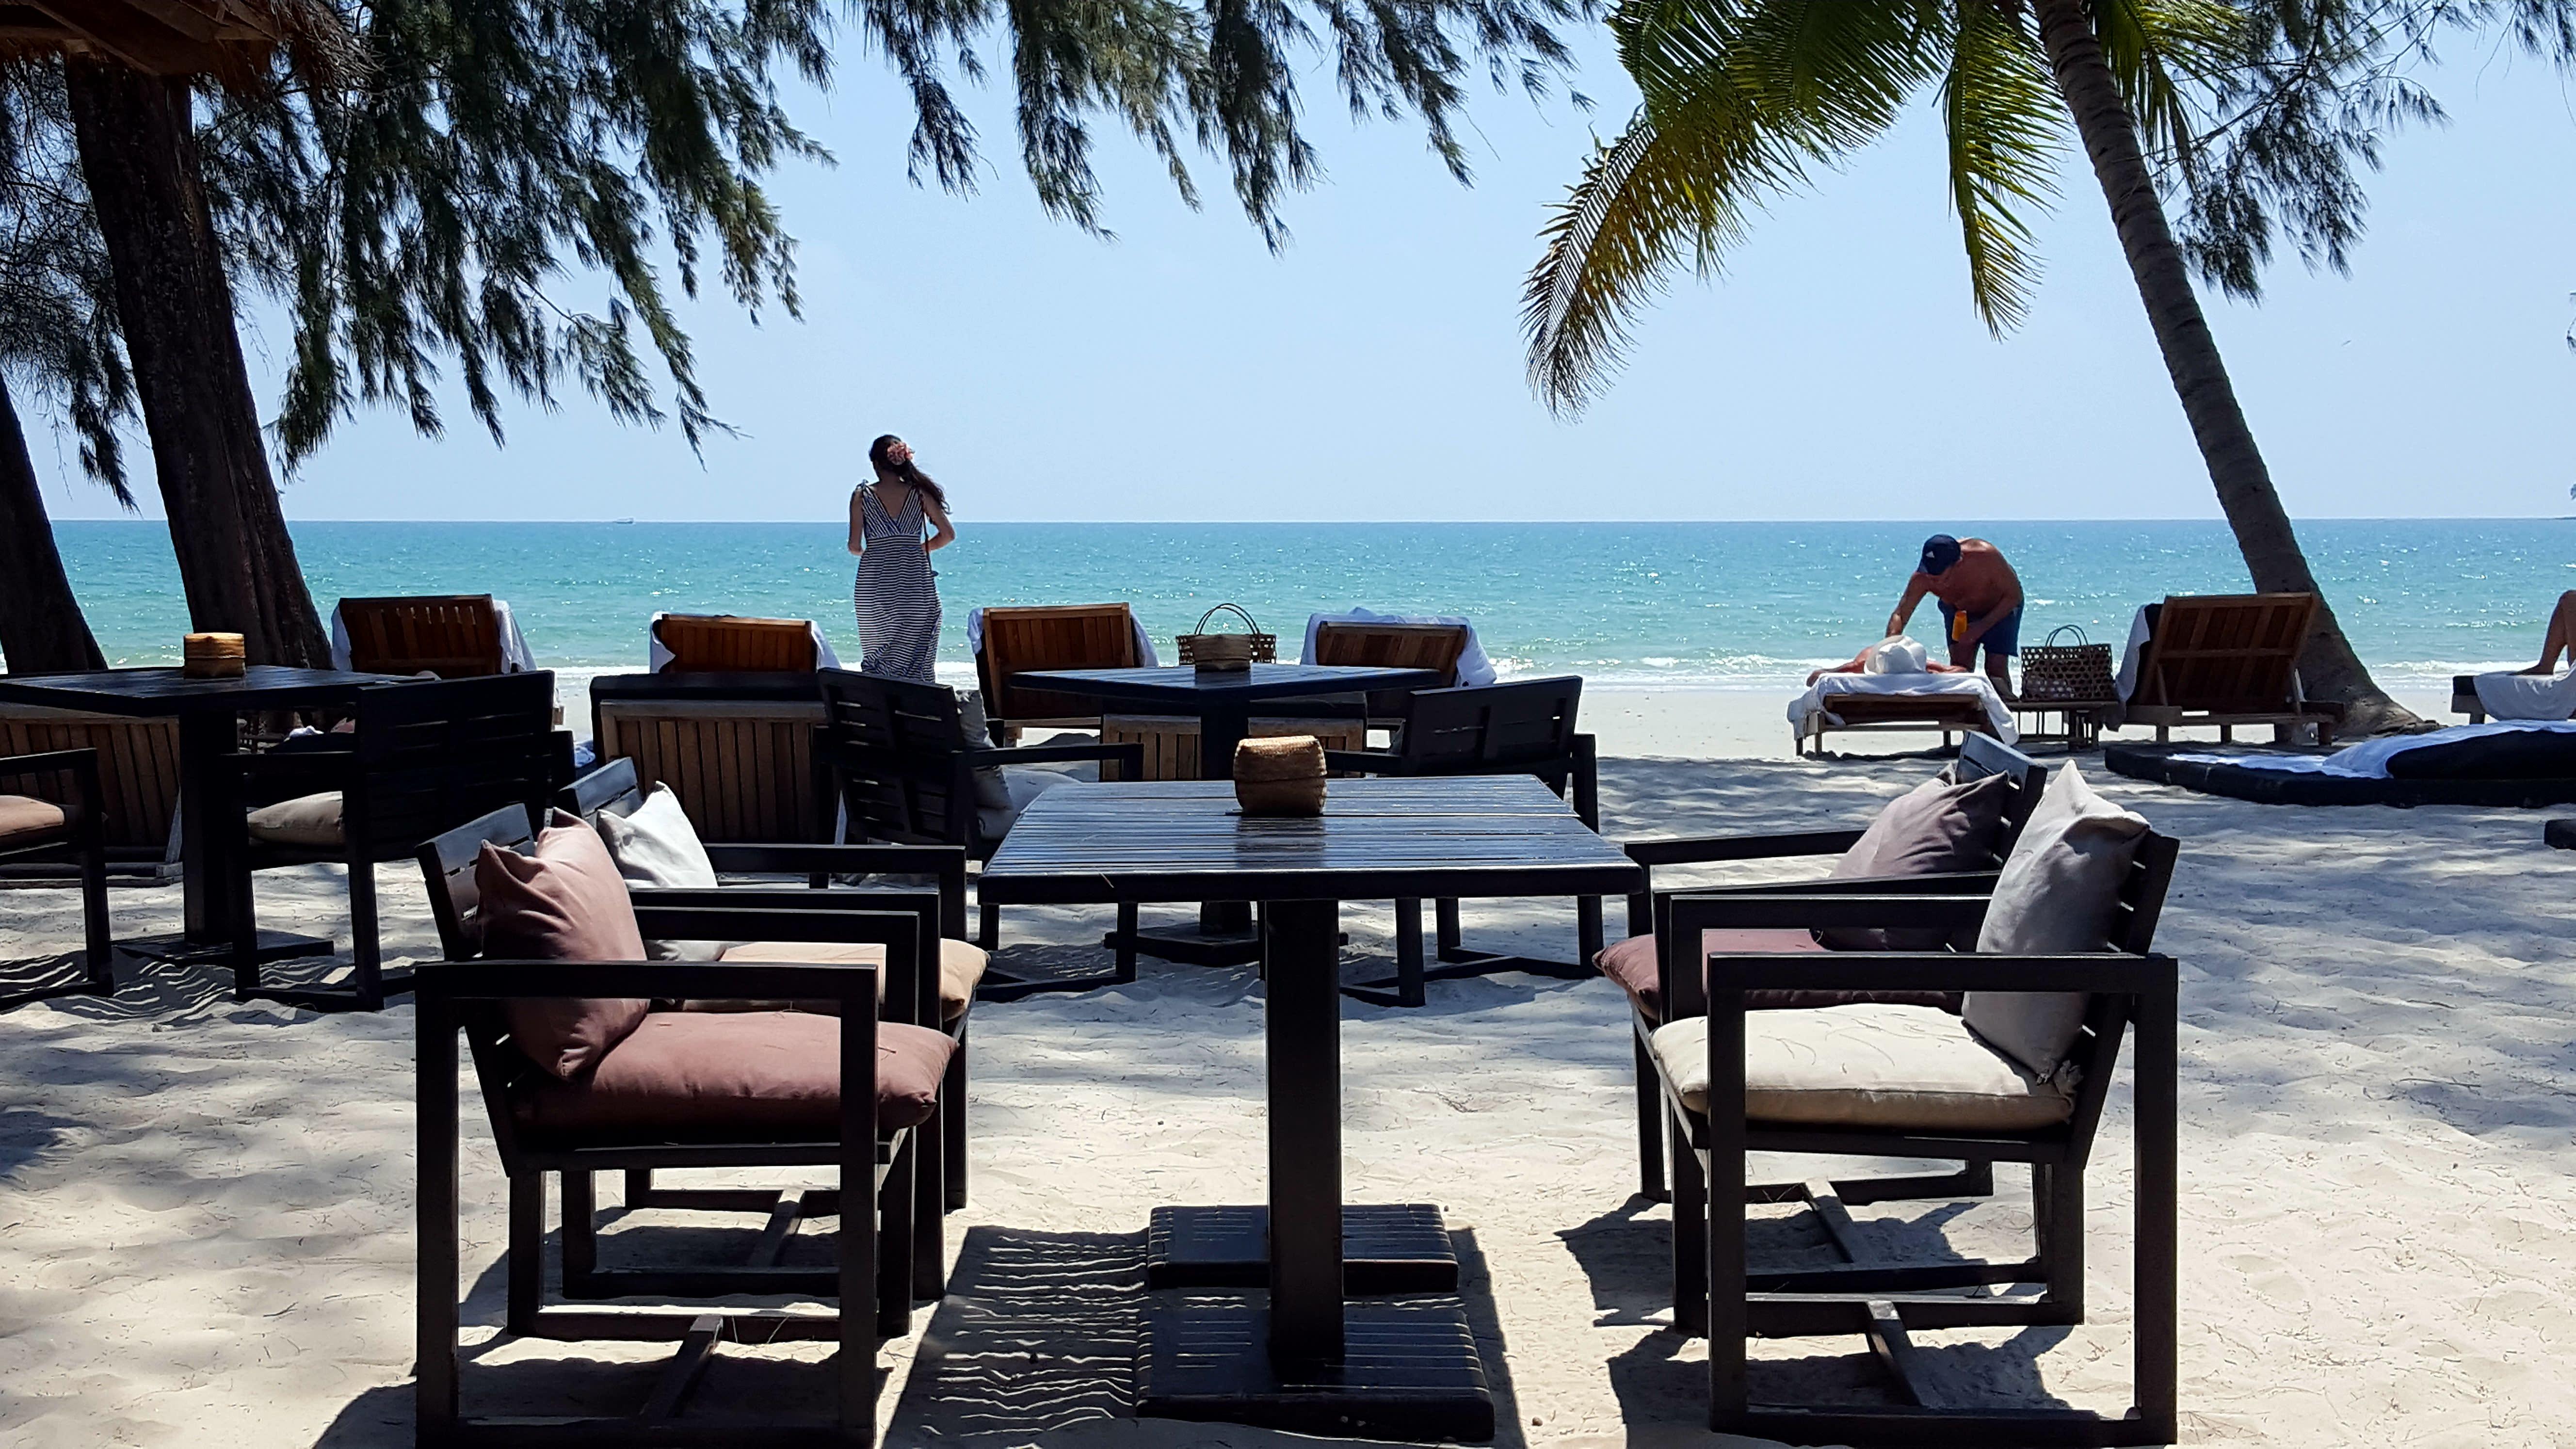 Cambogia spiaggia di Sihanoukville